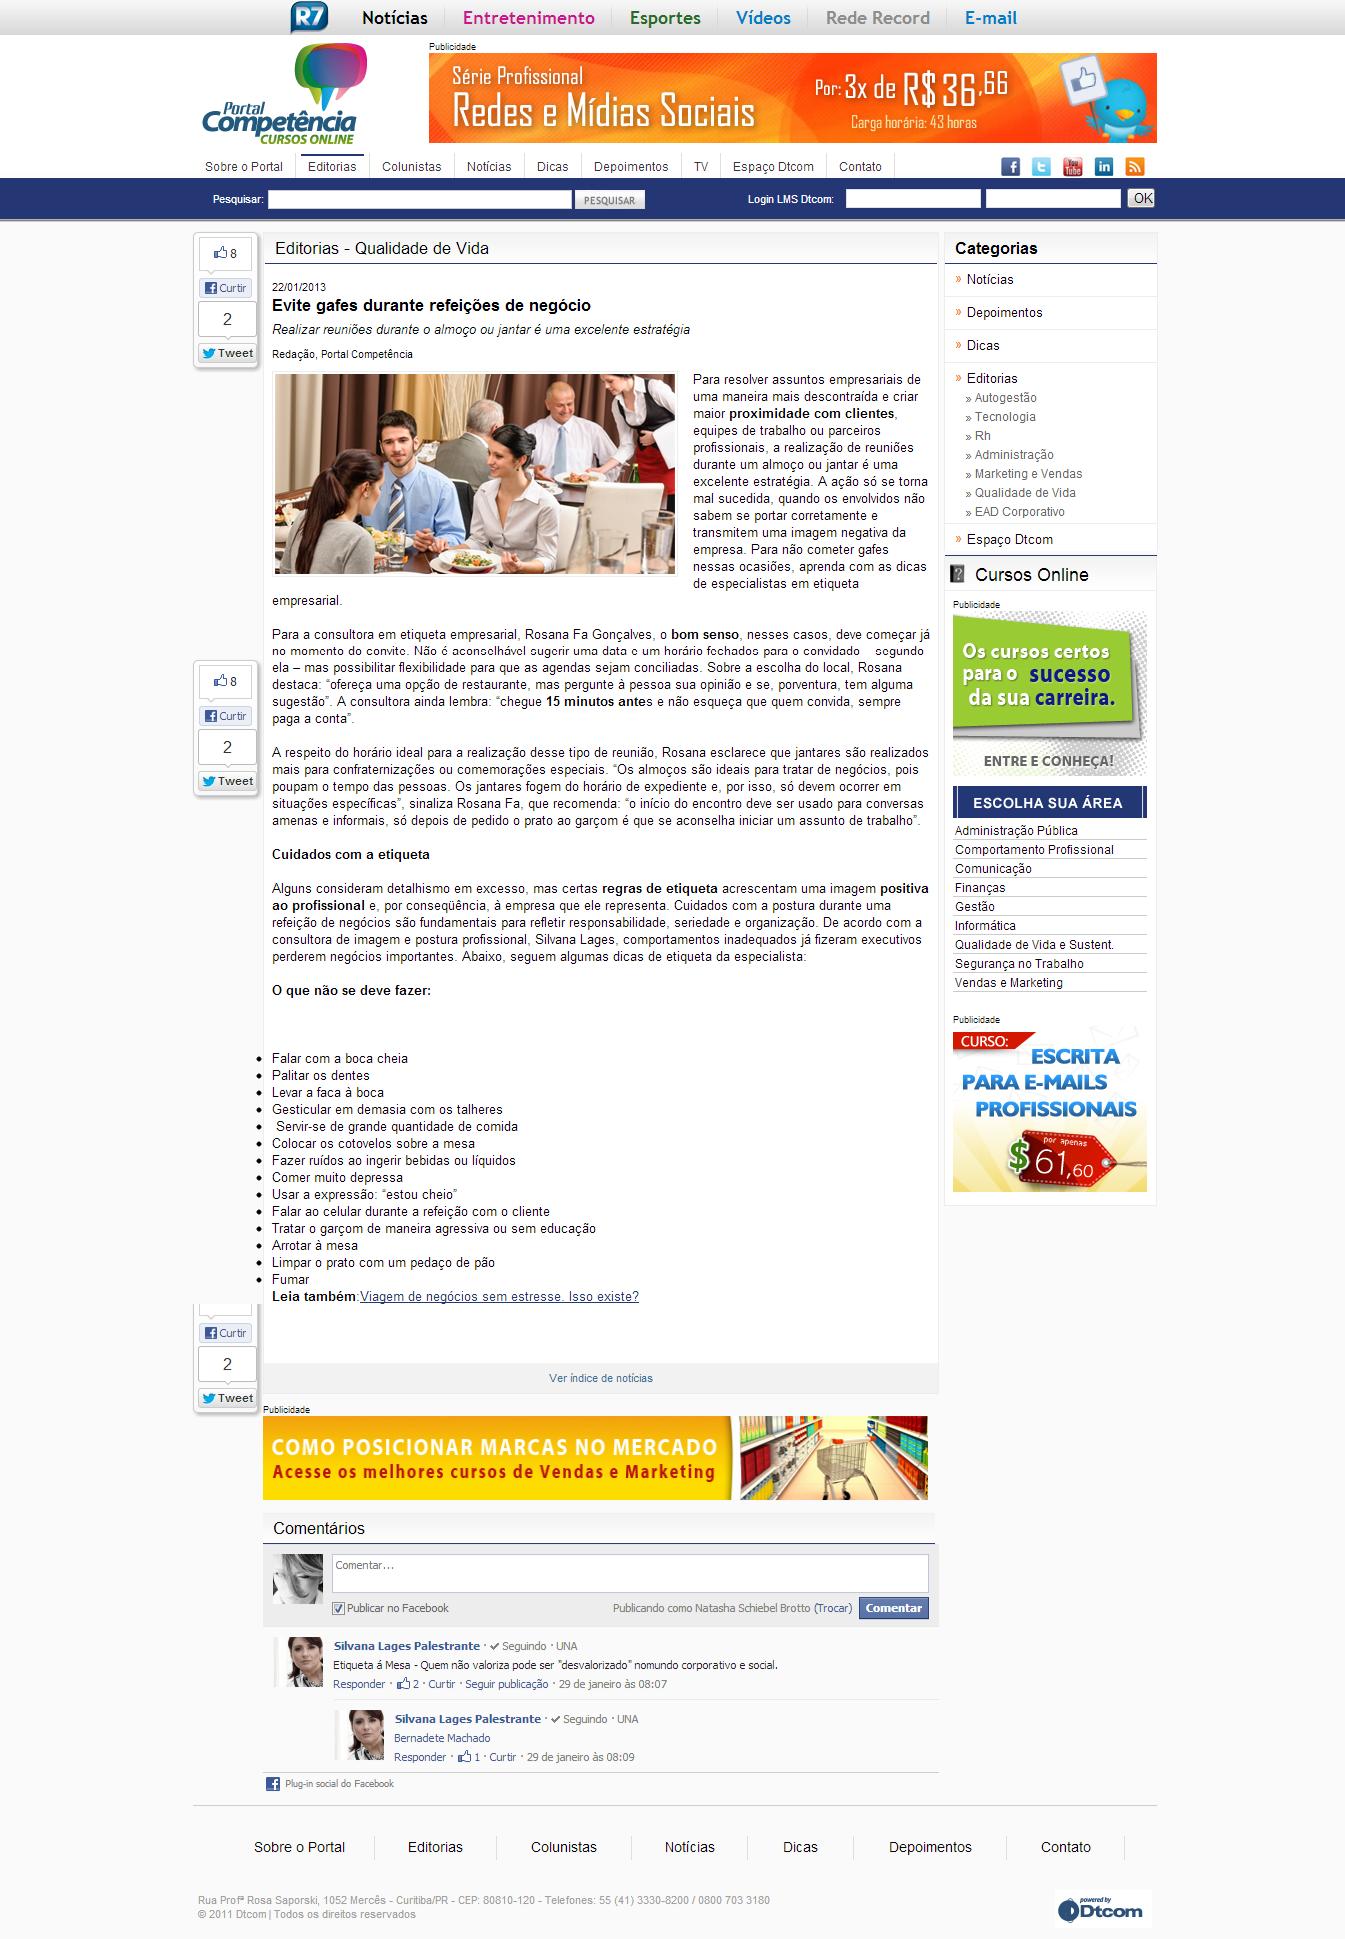 Portal da Competência - 22/01/2013 (http://bit.ly/ZtwdCW)